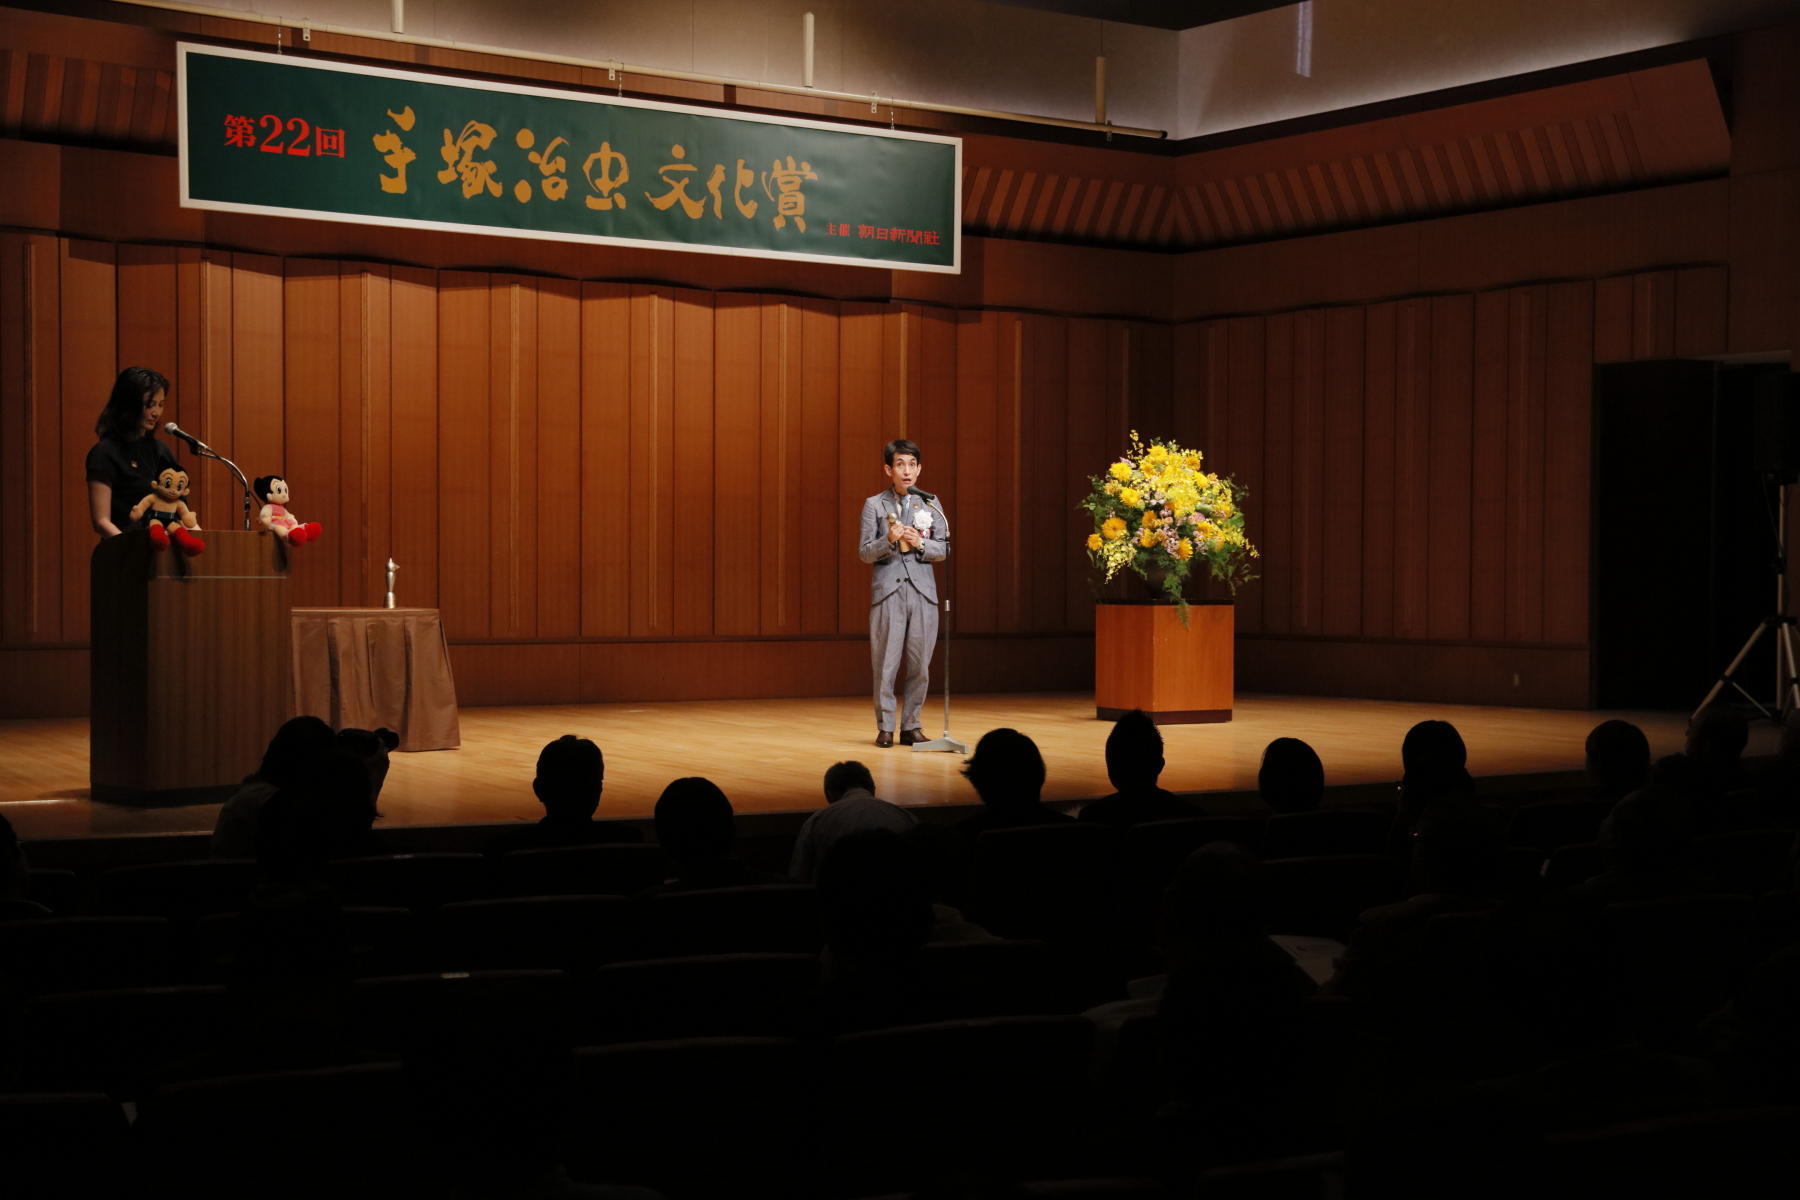 http://news.yoshimoto.co.jp/20180608001825-a4299775b5126e394dd52d7870b182659c0e52f6.jpg